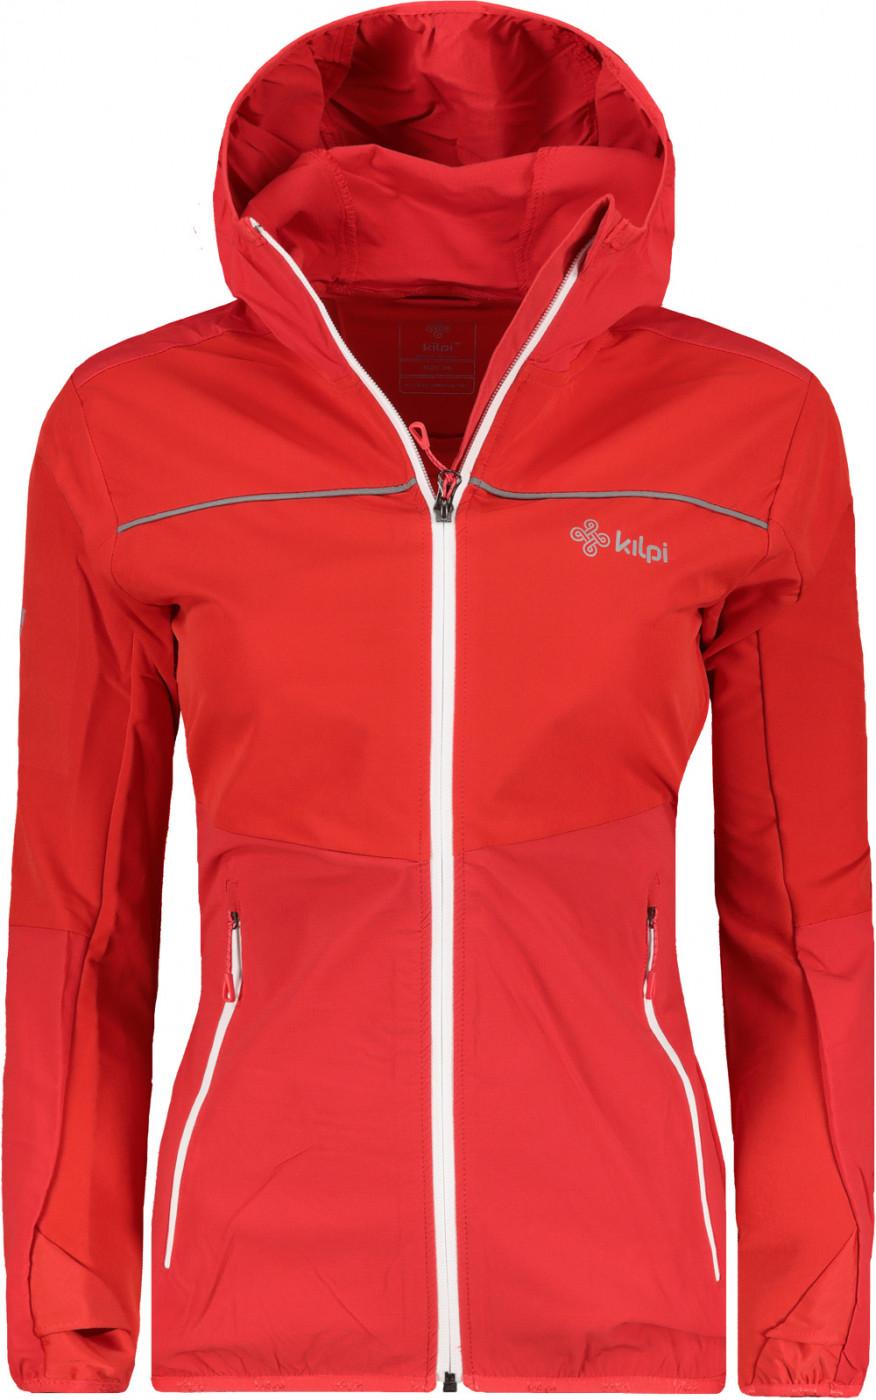 Women's outdoor jacket Kilpi JOSHUA-W